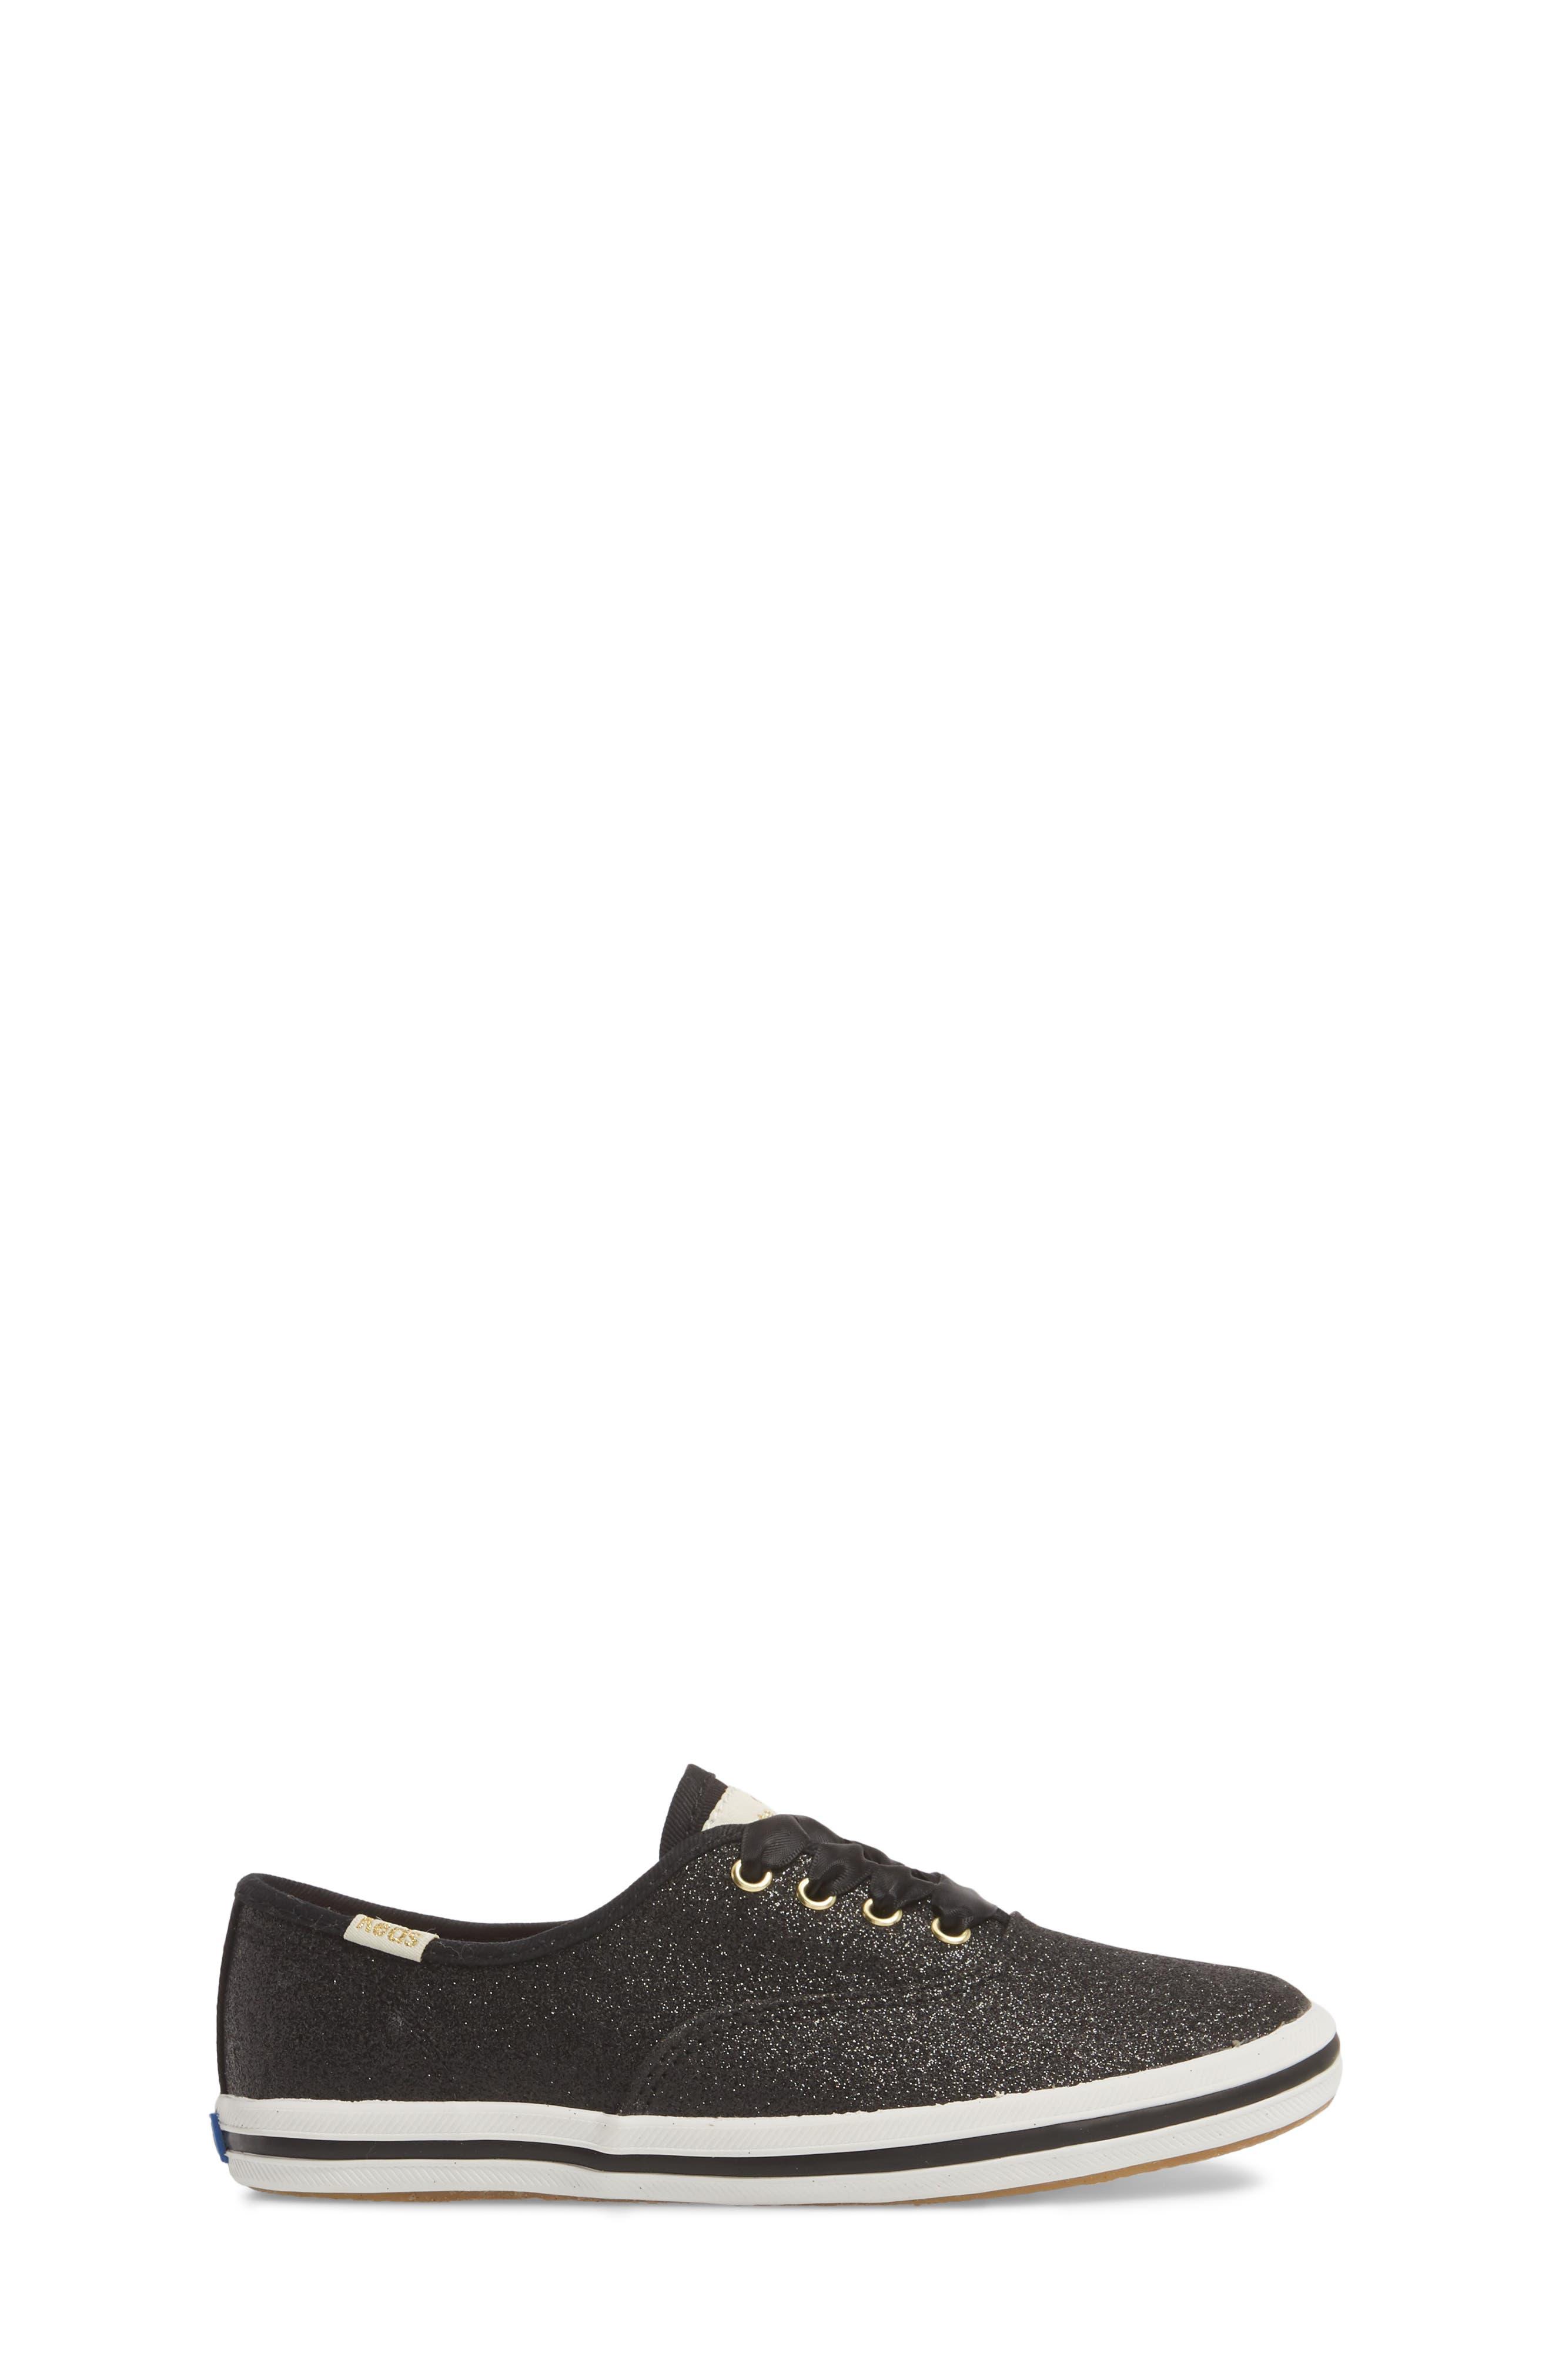 x kate spade new york Champion Glitter Sneaker,                             Alternate thumbnail 3, color,                             Black